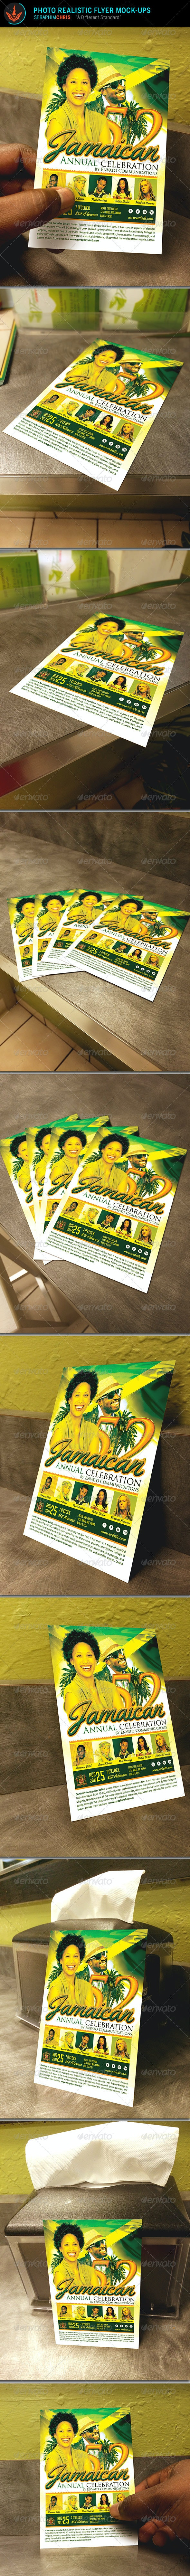 Photo Realistic Flyer Mock Up Templates - Flyers Print